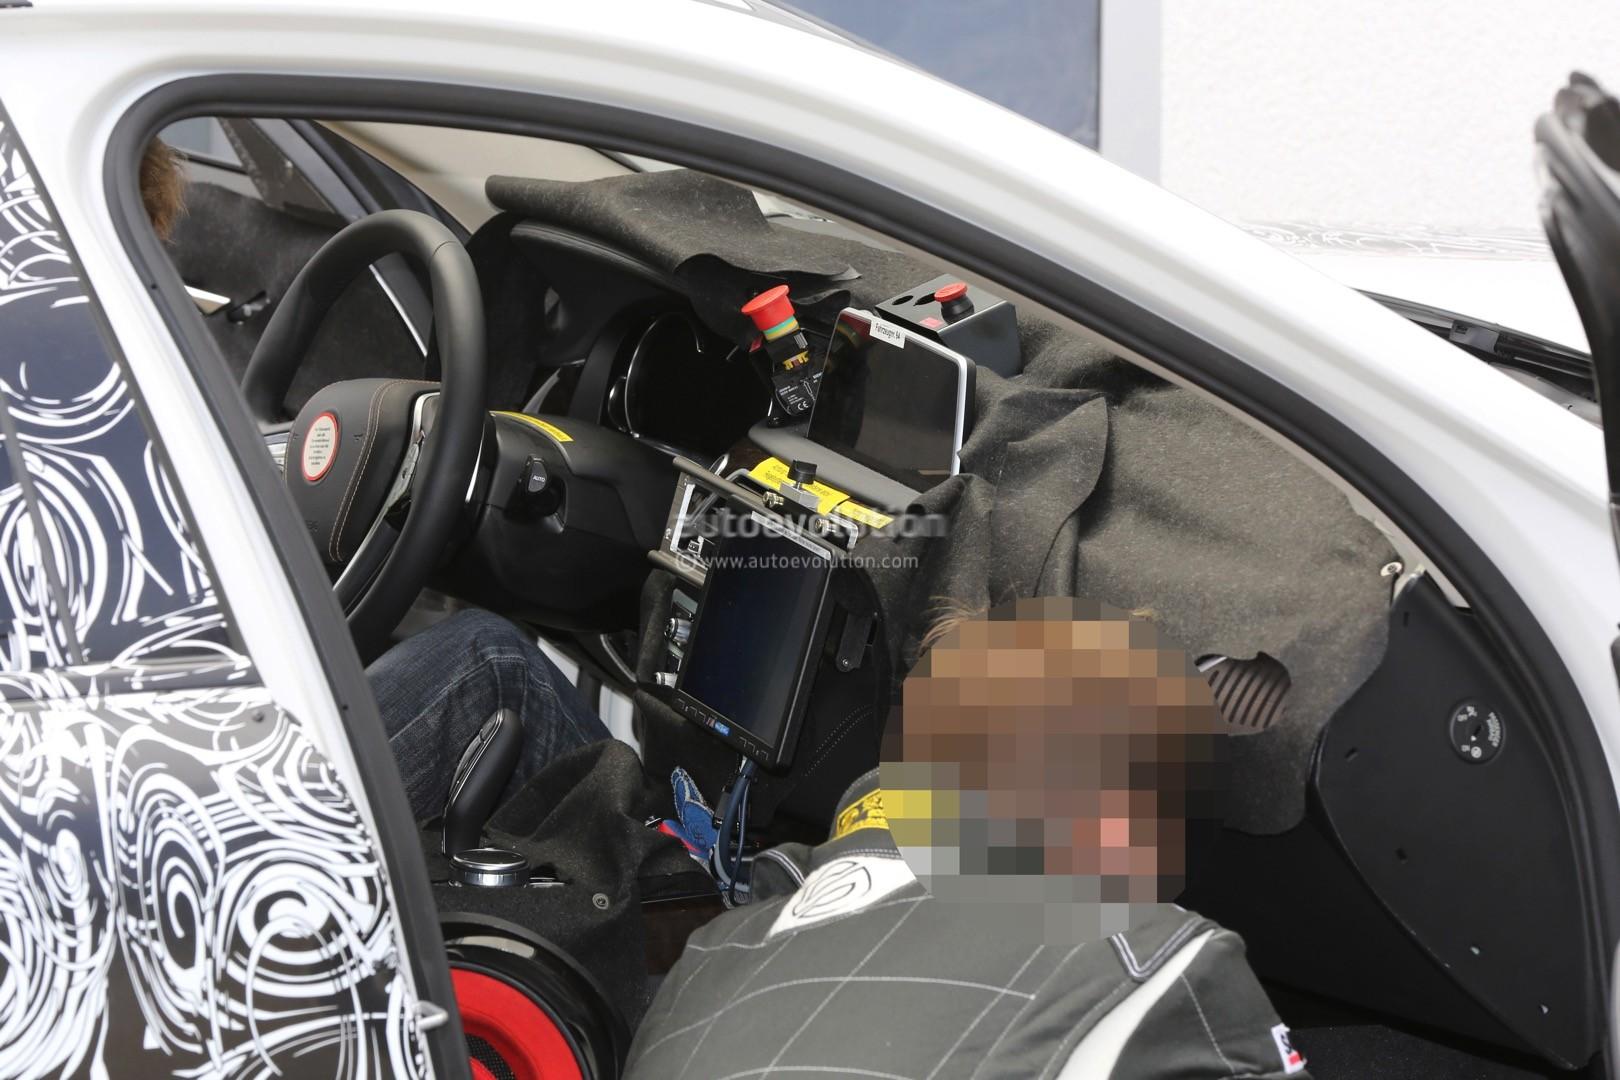 2017 Bmw G30 5 Series Spied Closer Prototype Interior Hints At 7 Series Autoevolution